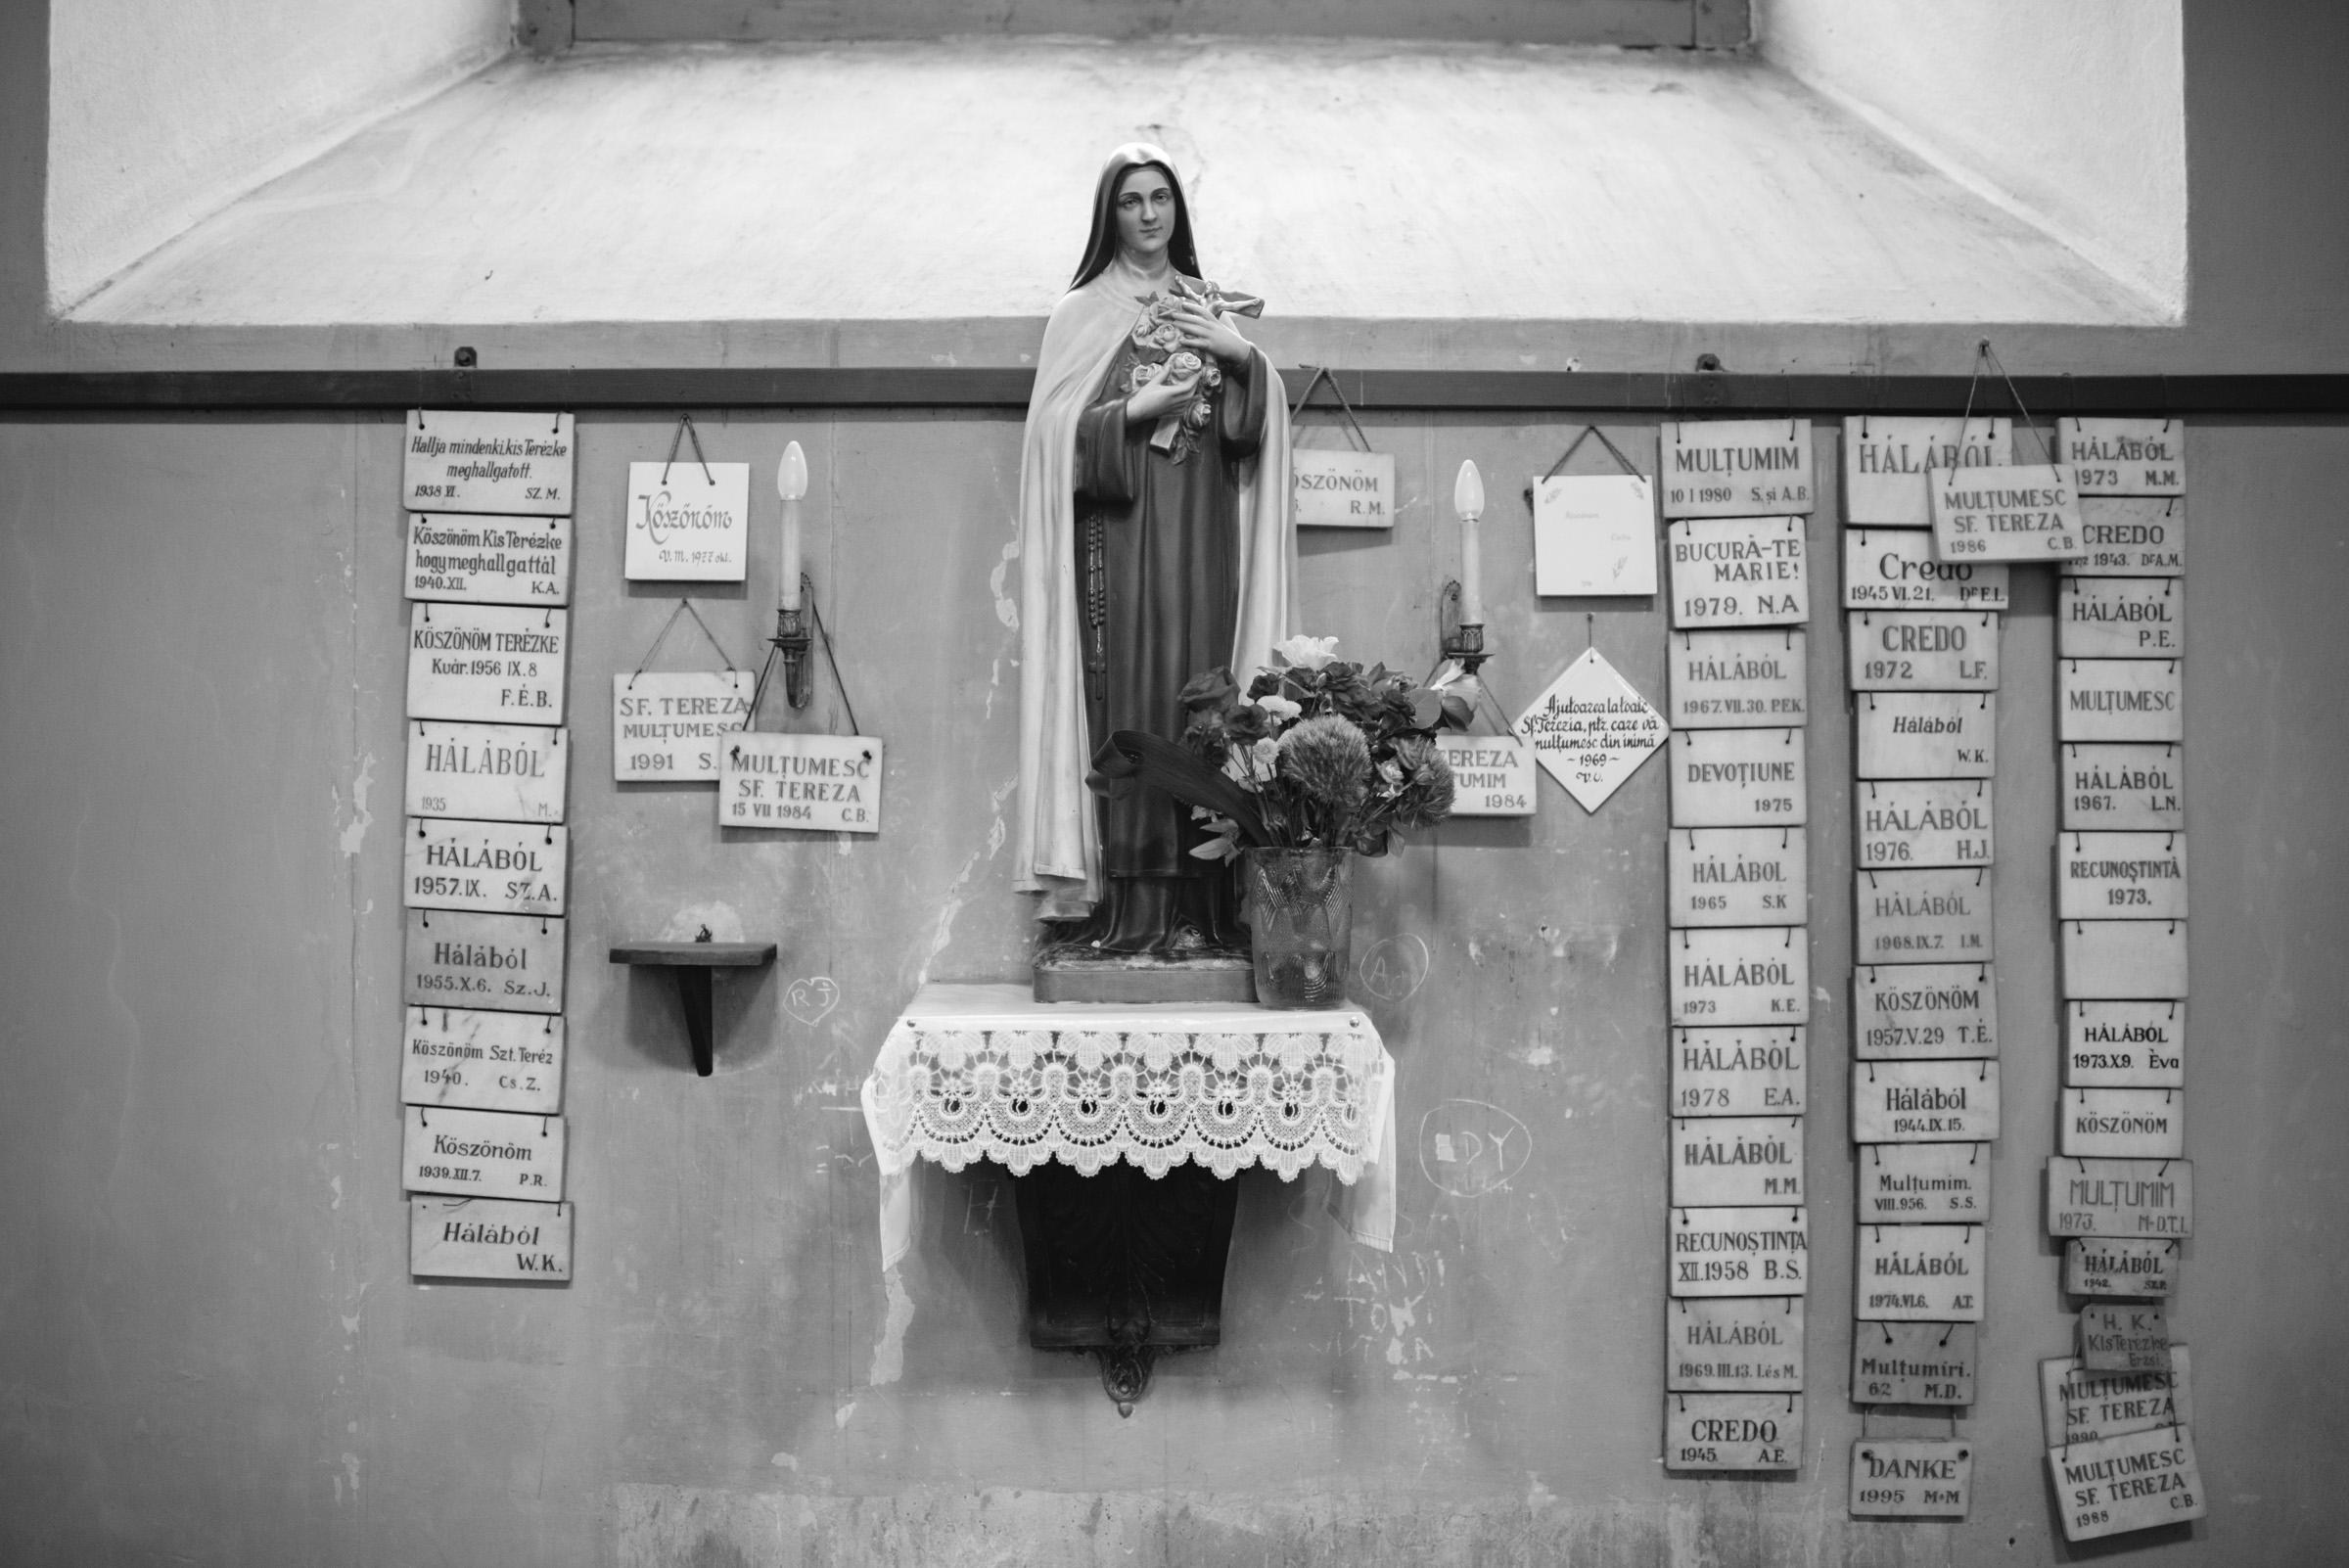 Cluj-Napoca Piarists' Church Interior